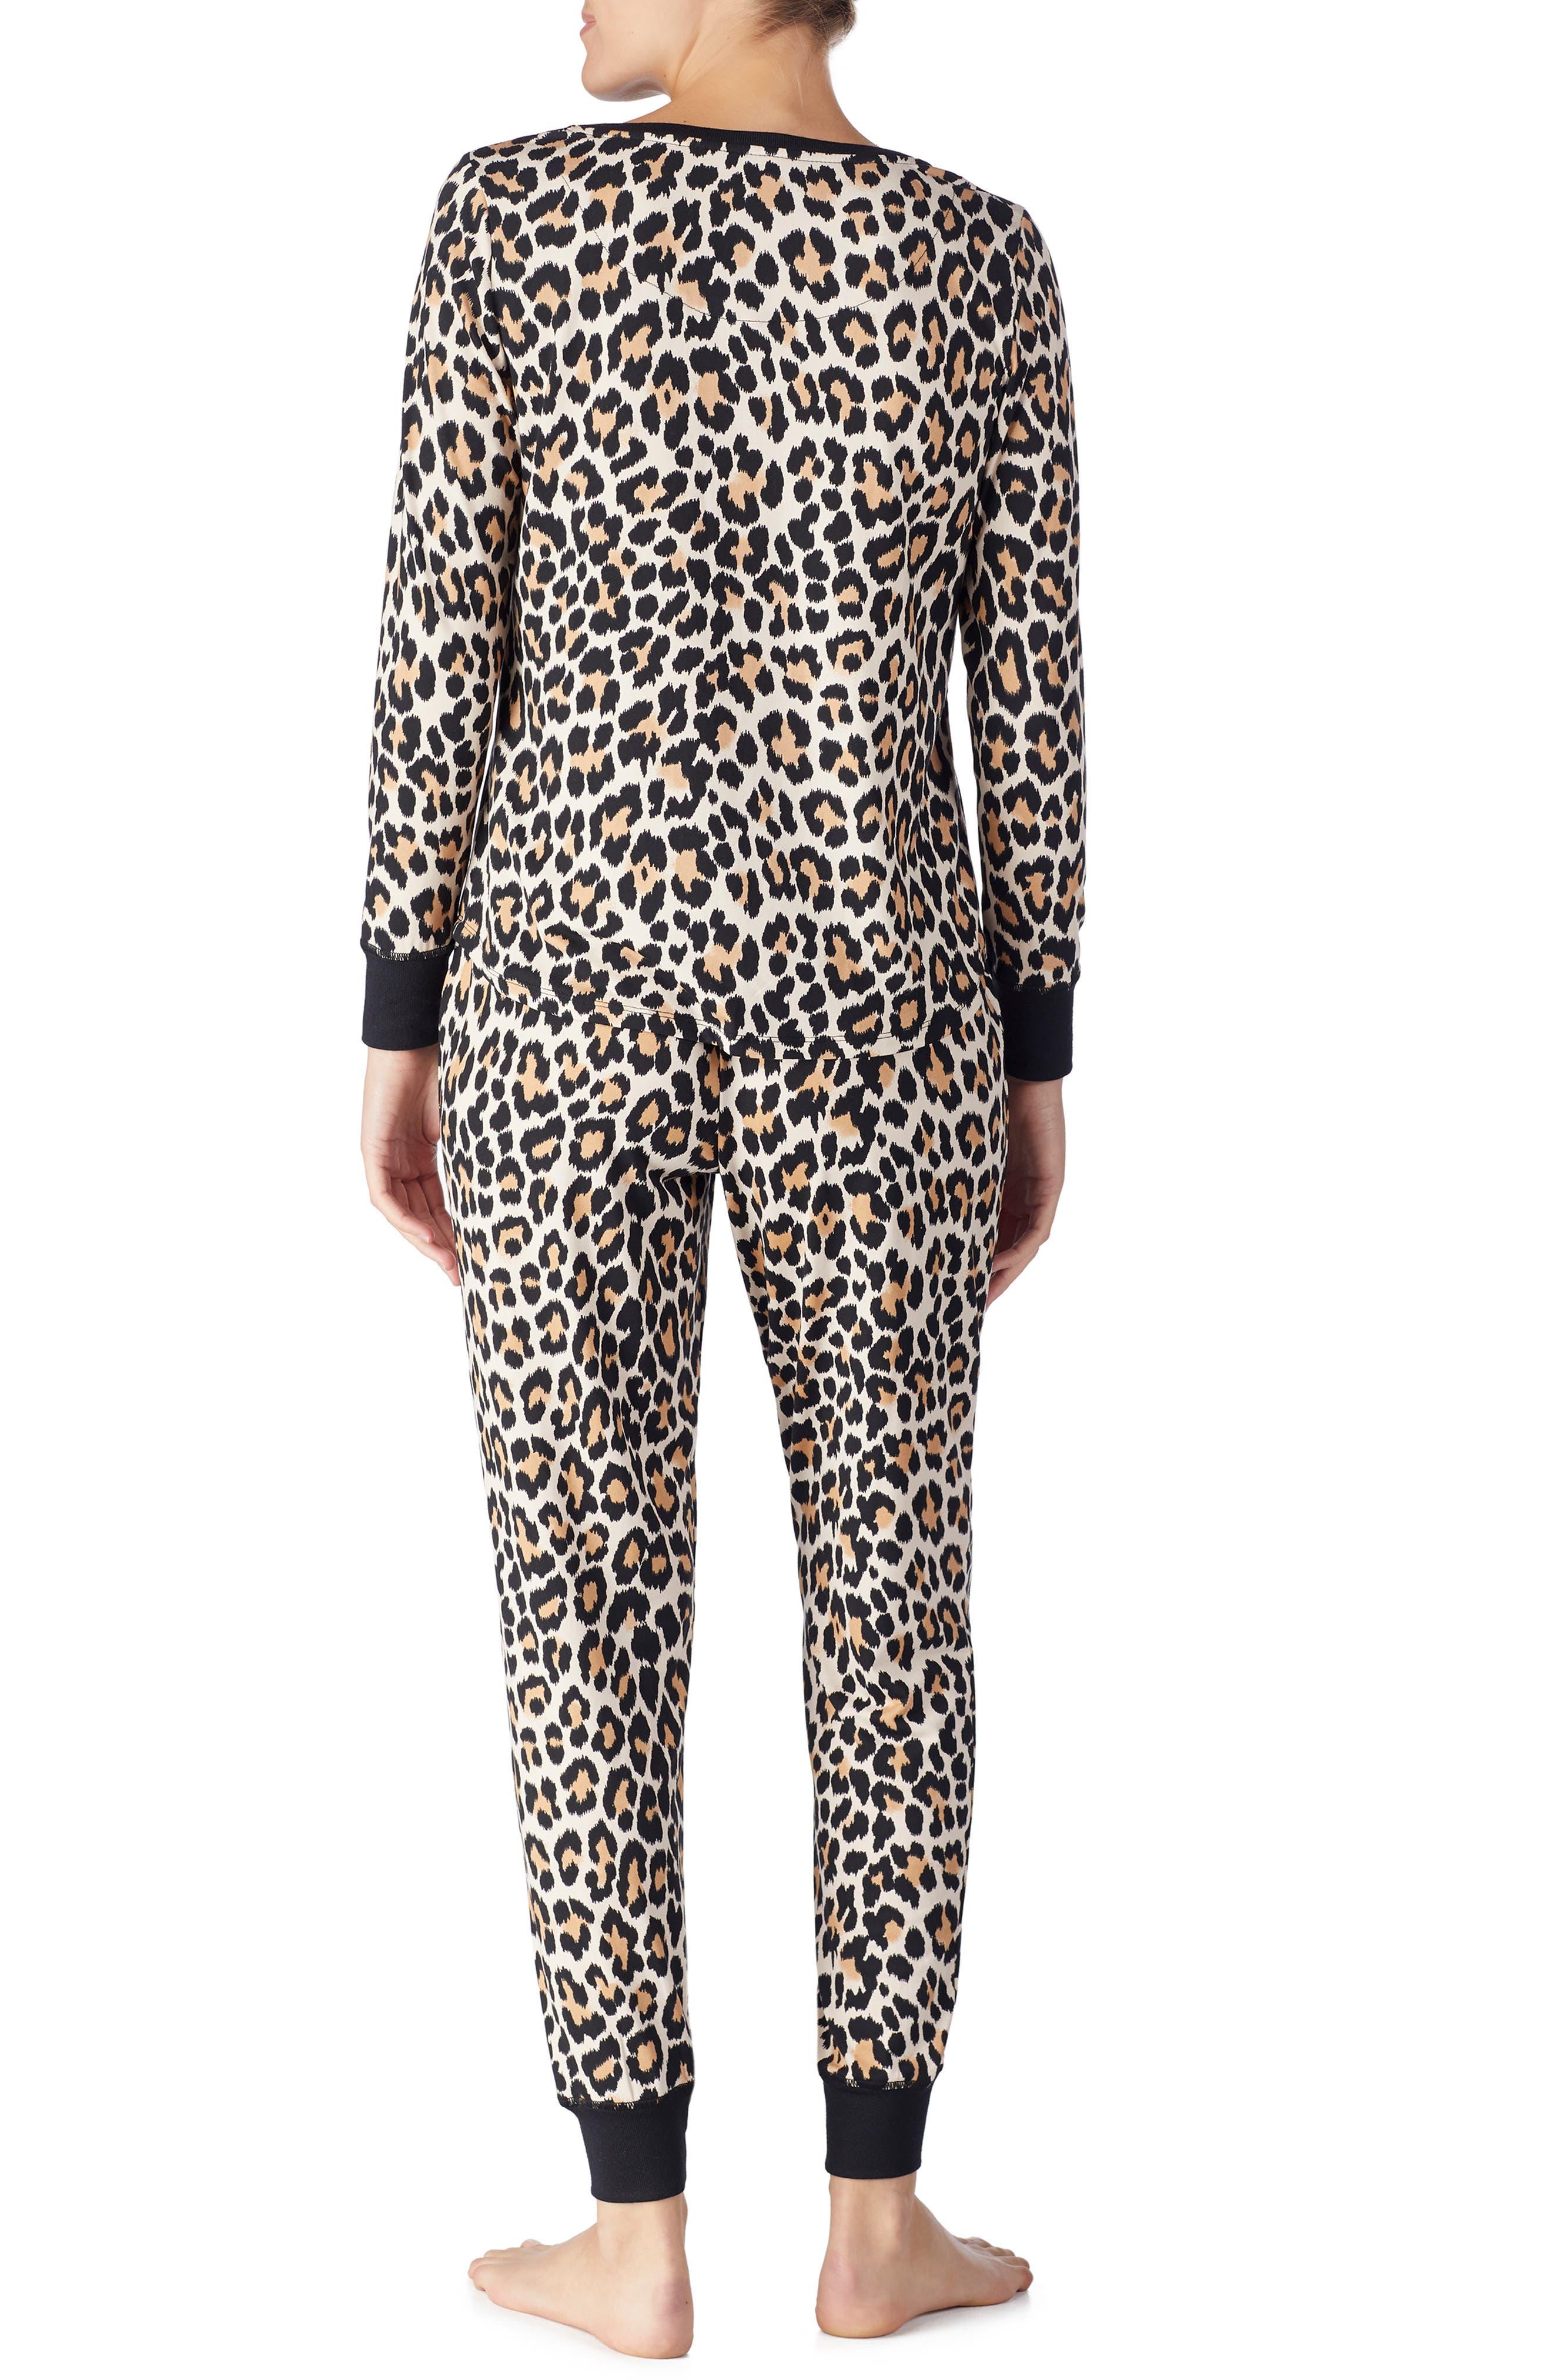 jogger long pajamas,                             Alternate thumbnail 2, color,                             209